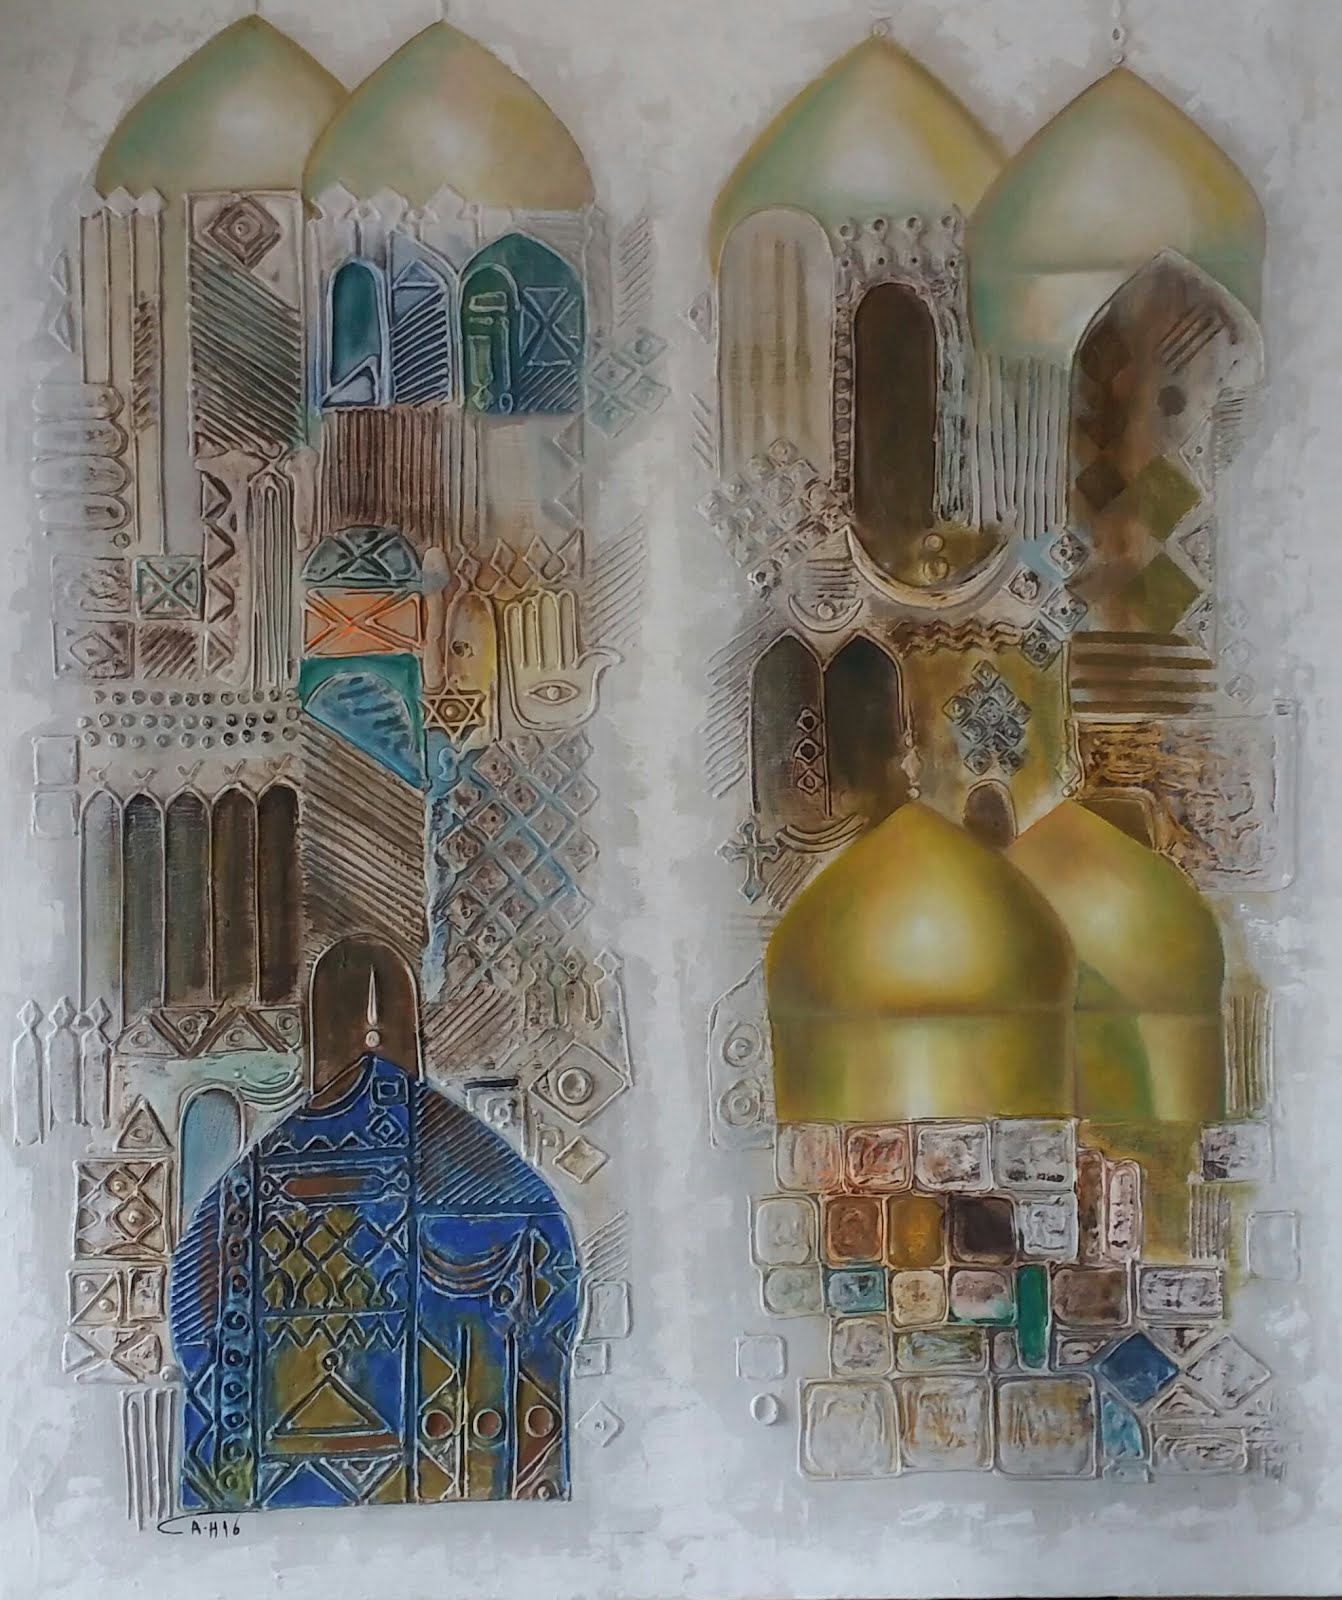 April artist-Ahmad Al Bujasim